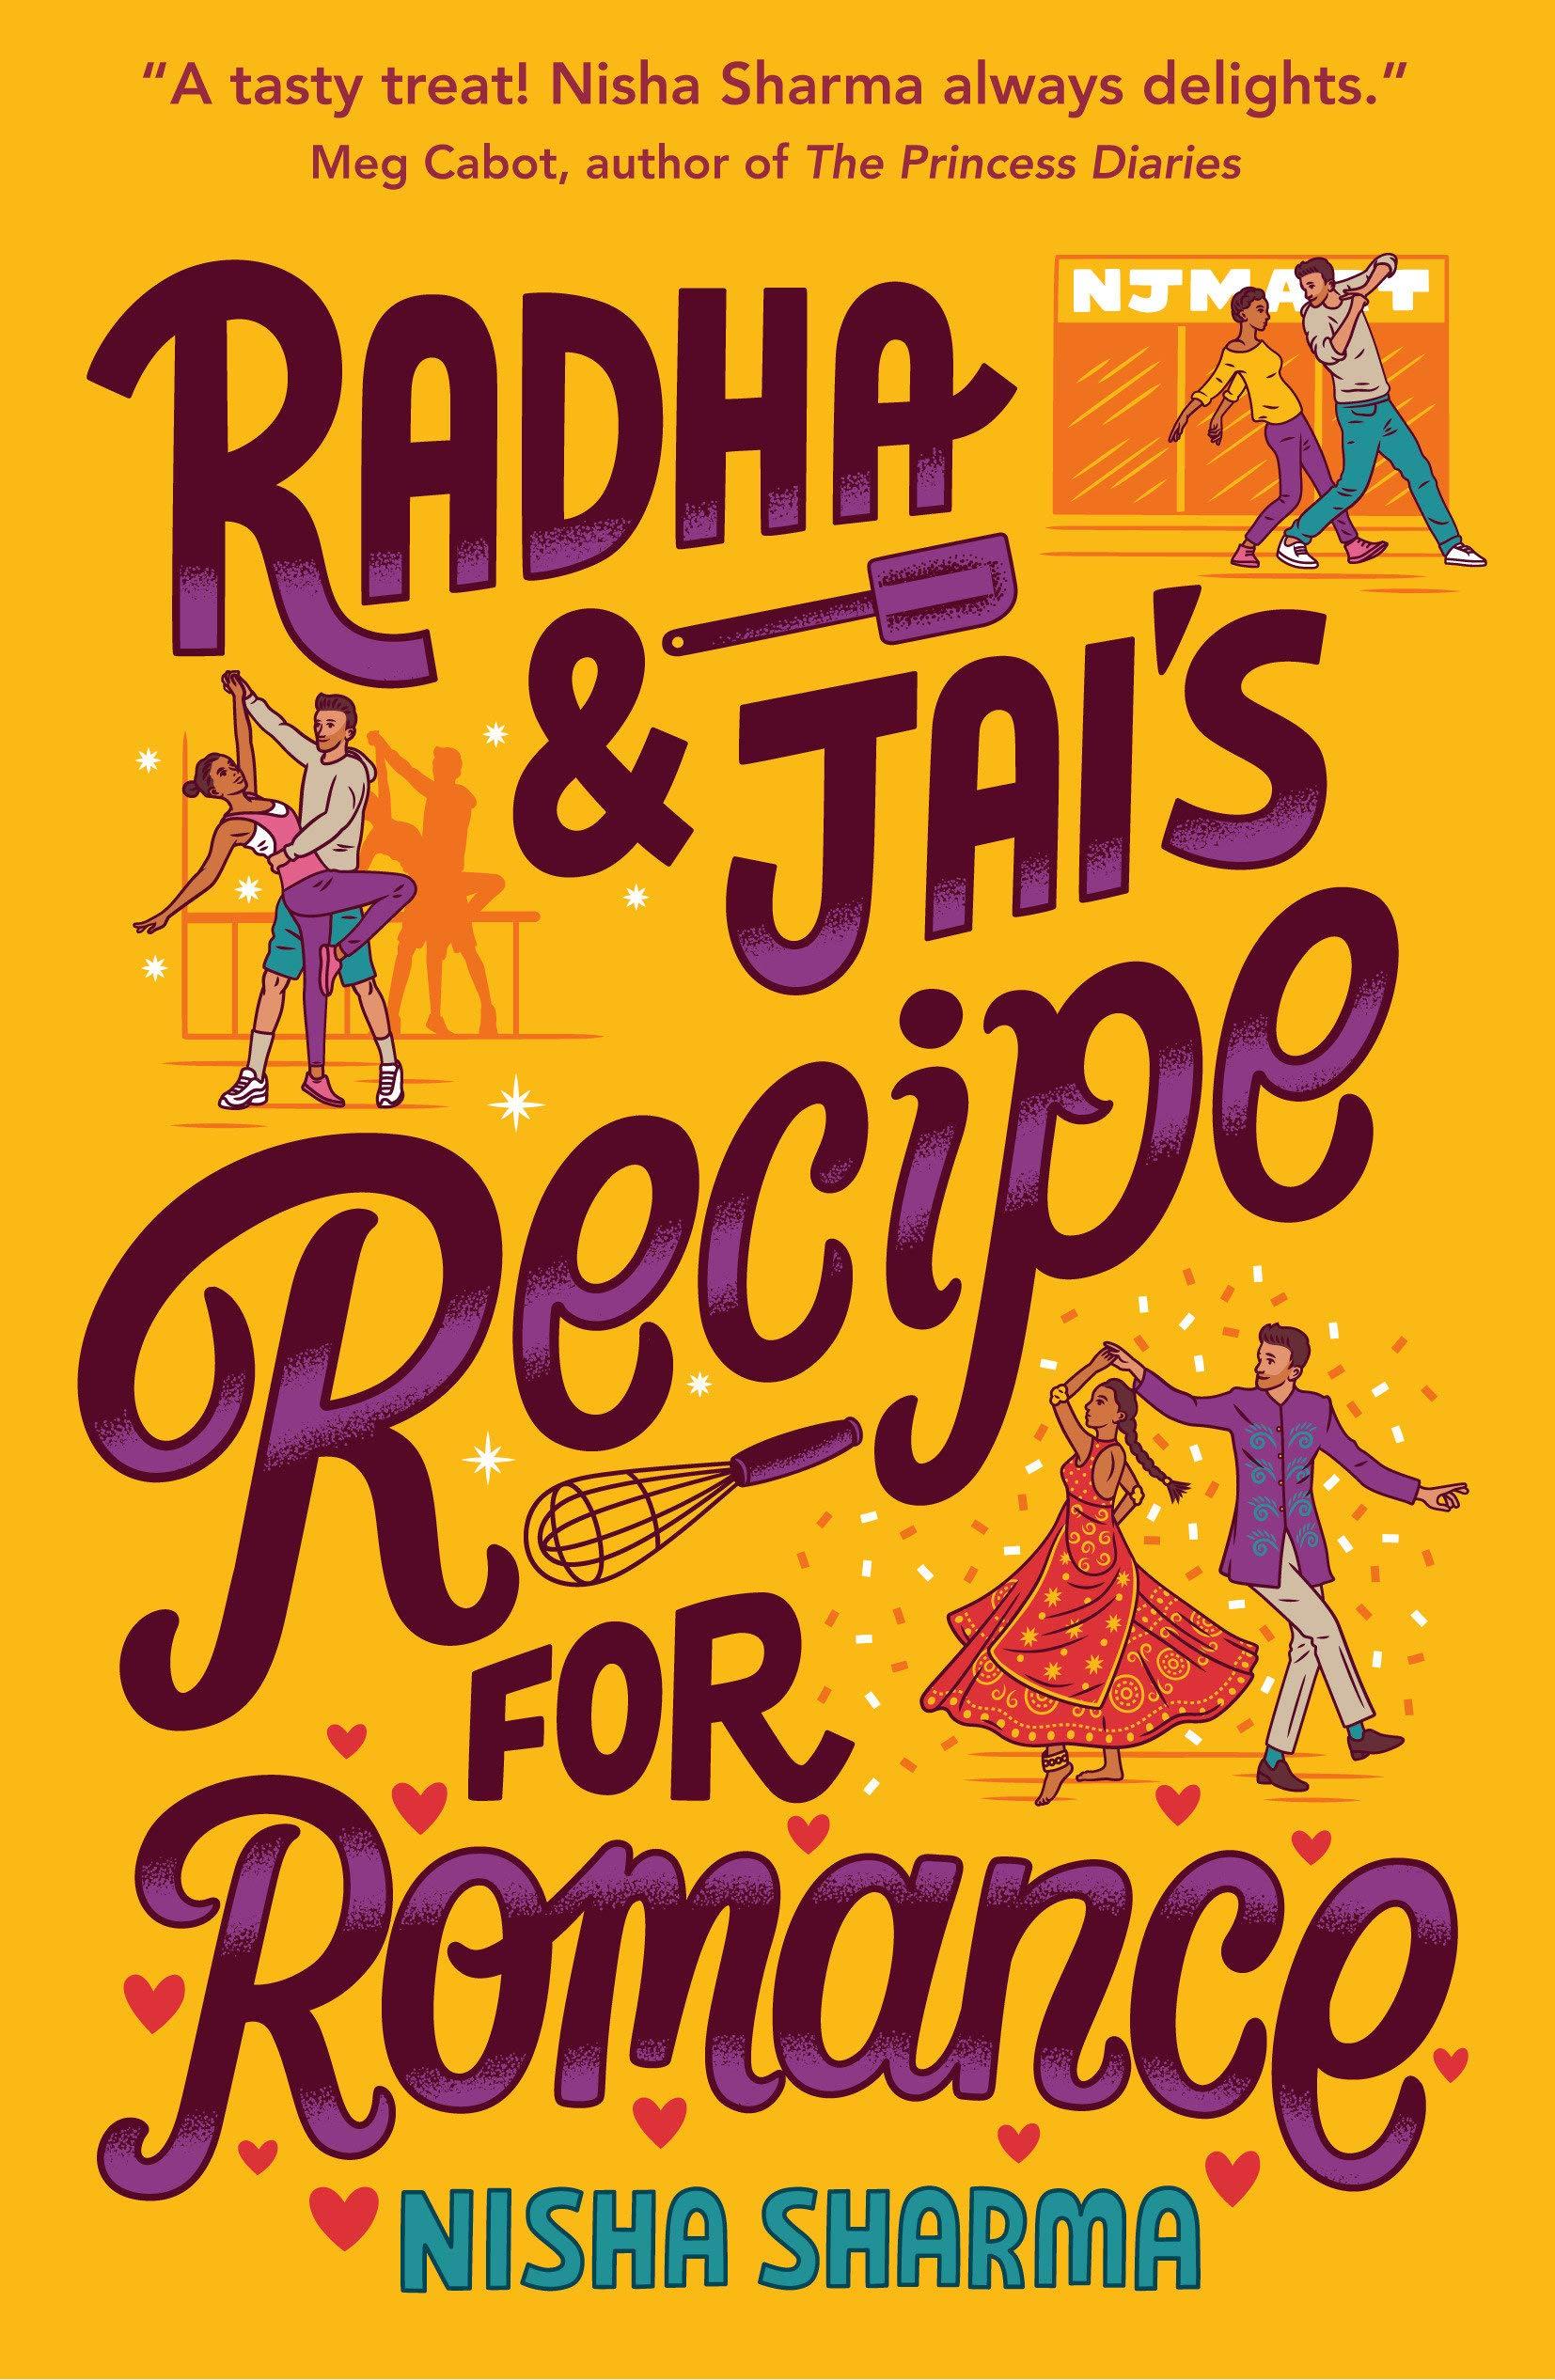 Amazon.com: Radha & Jai's Recipe for Romance (9780553523294): Sharma,  Nisha: Books